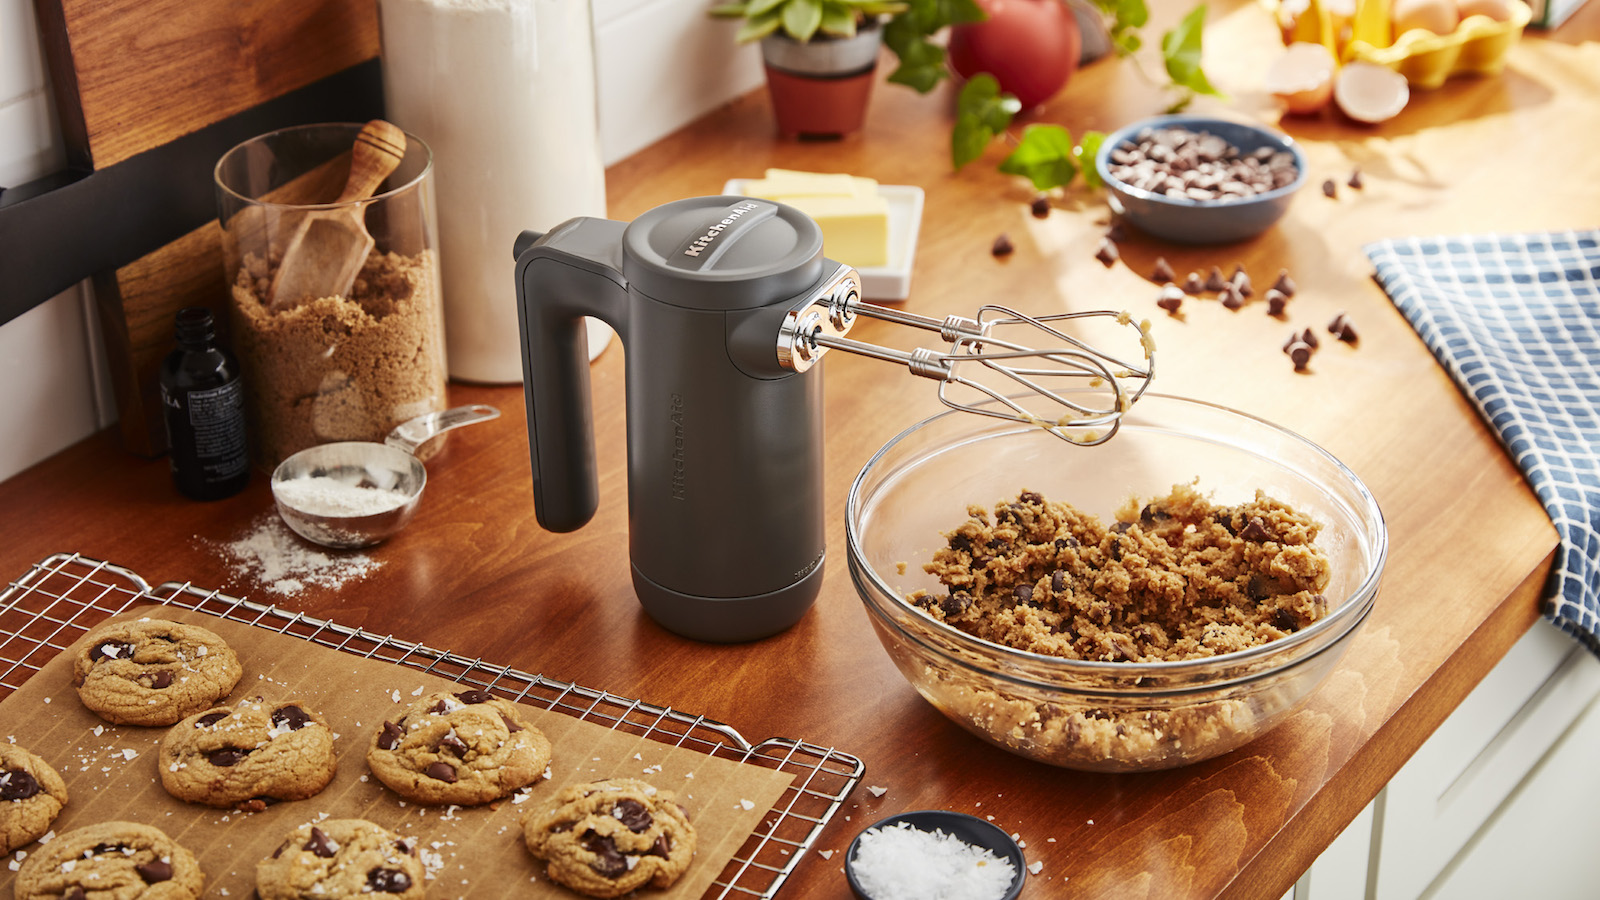 KitchenAid-Cordless-7-Speed-Hand-Mixer-01.jpg